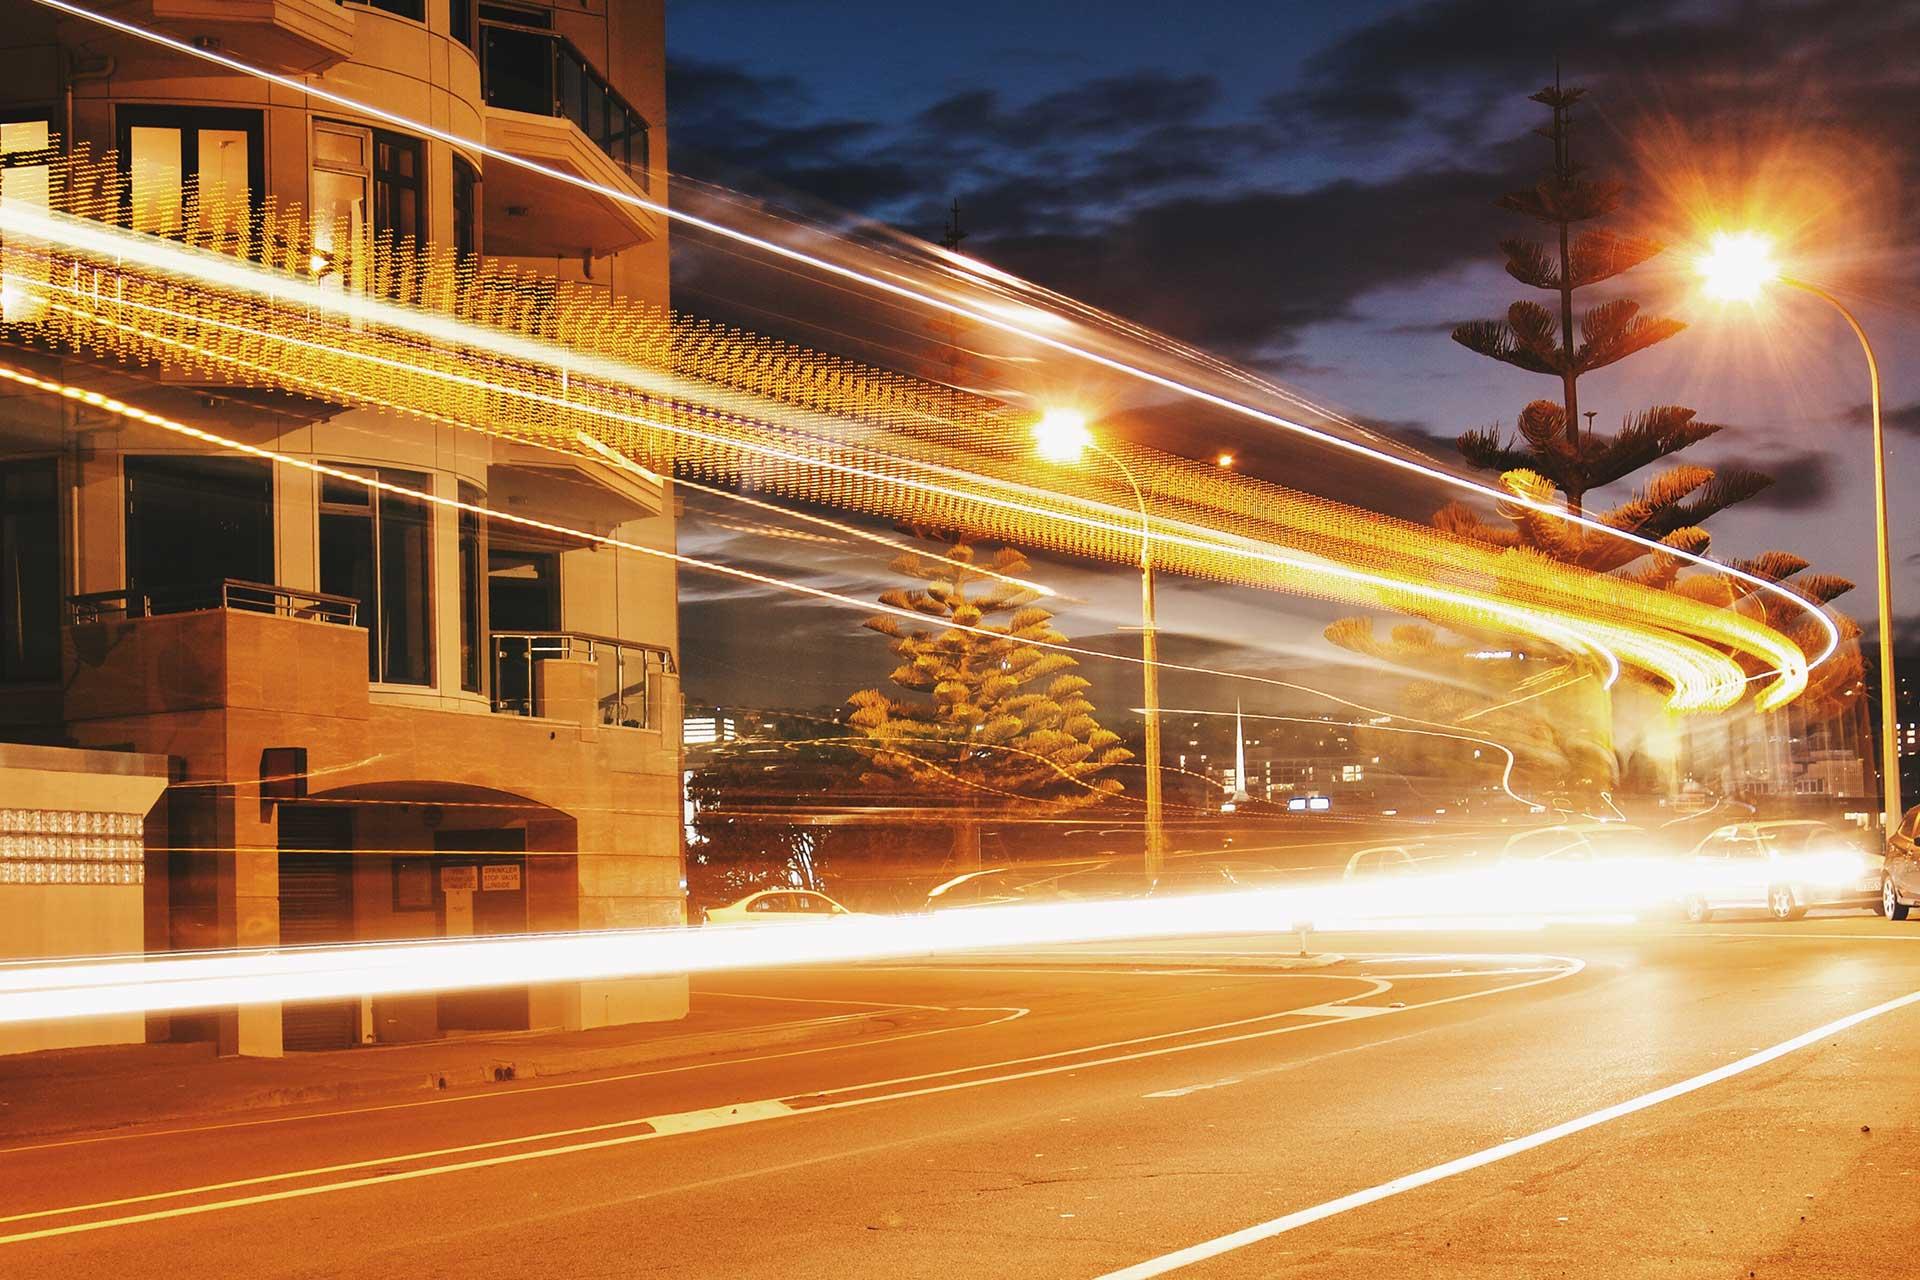 Lightstream on a busy street